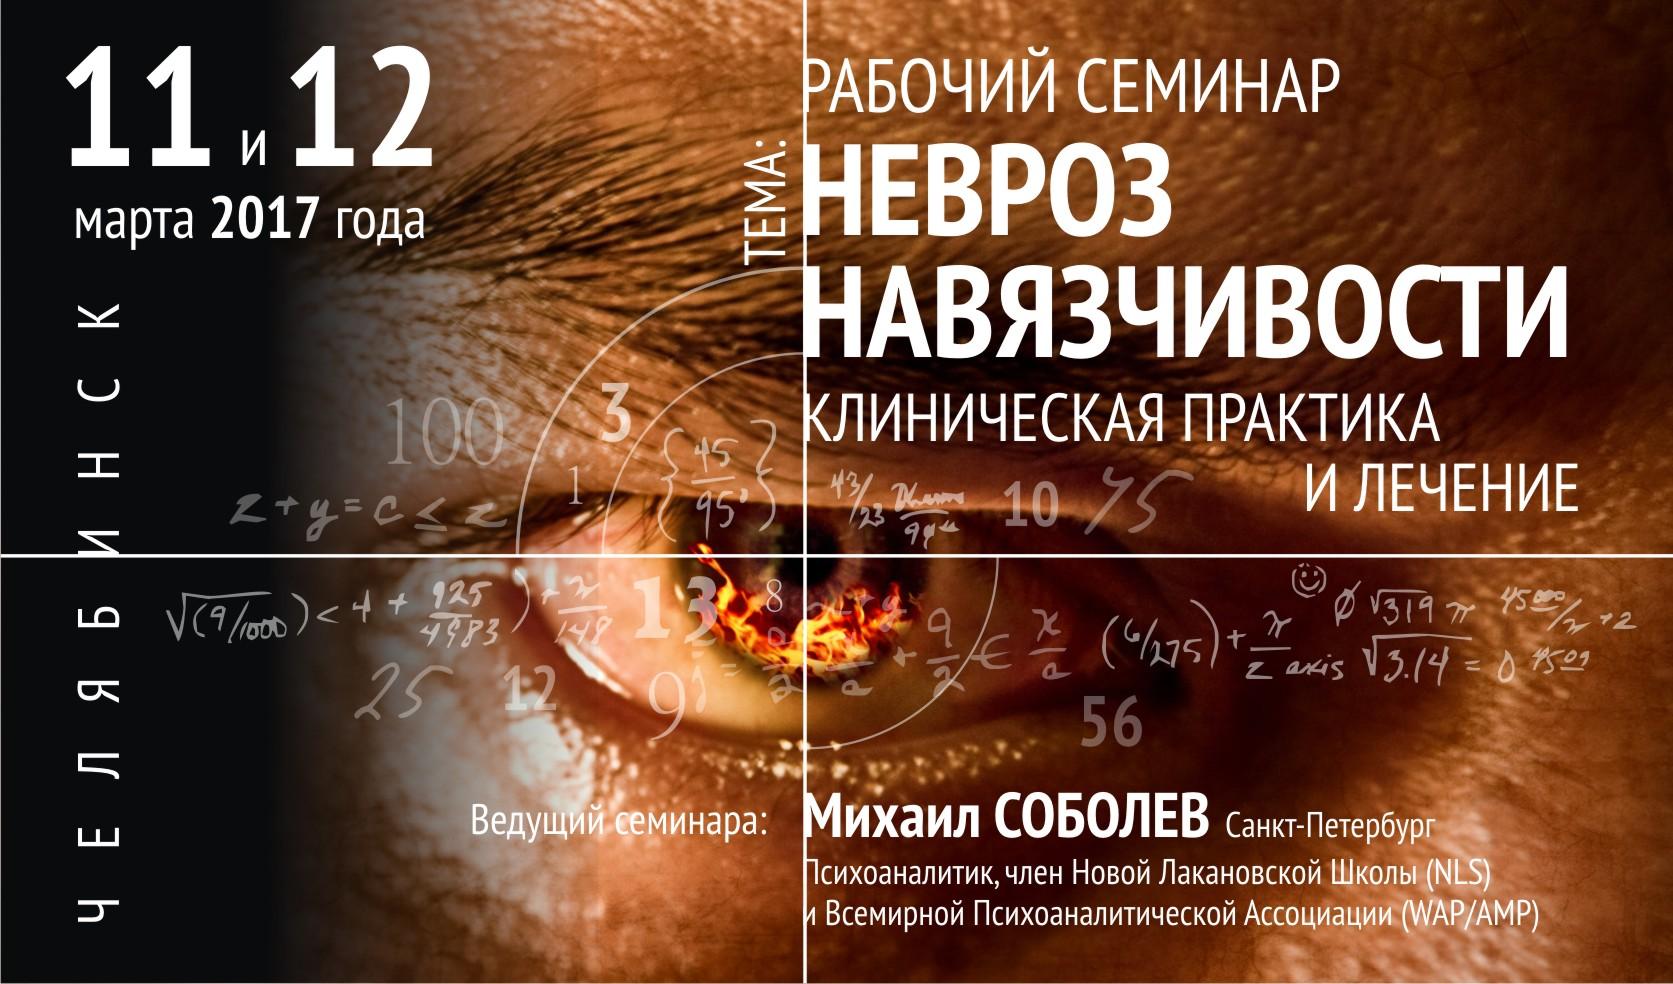 Психотерапевт спб депрессии навязчивости невроз консультации психотерапевта хабаровск